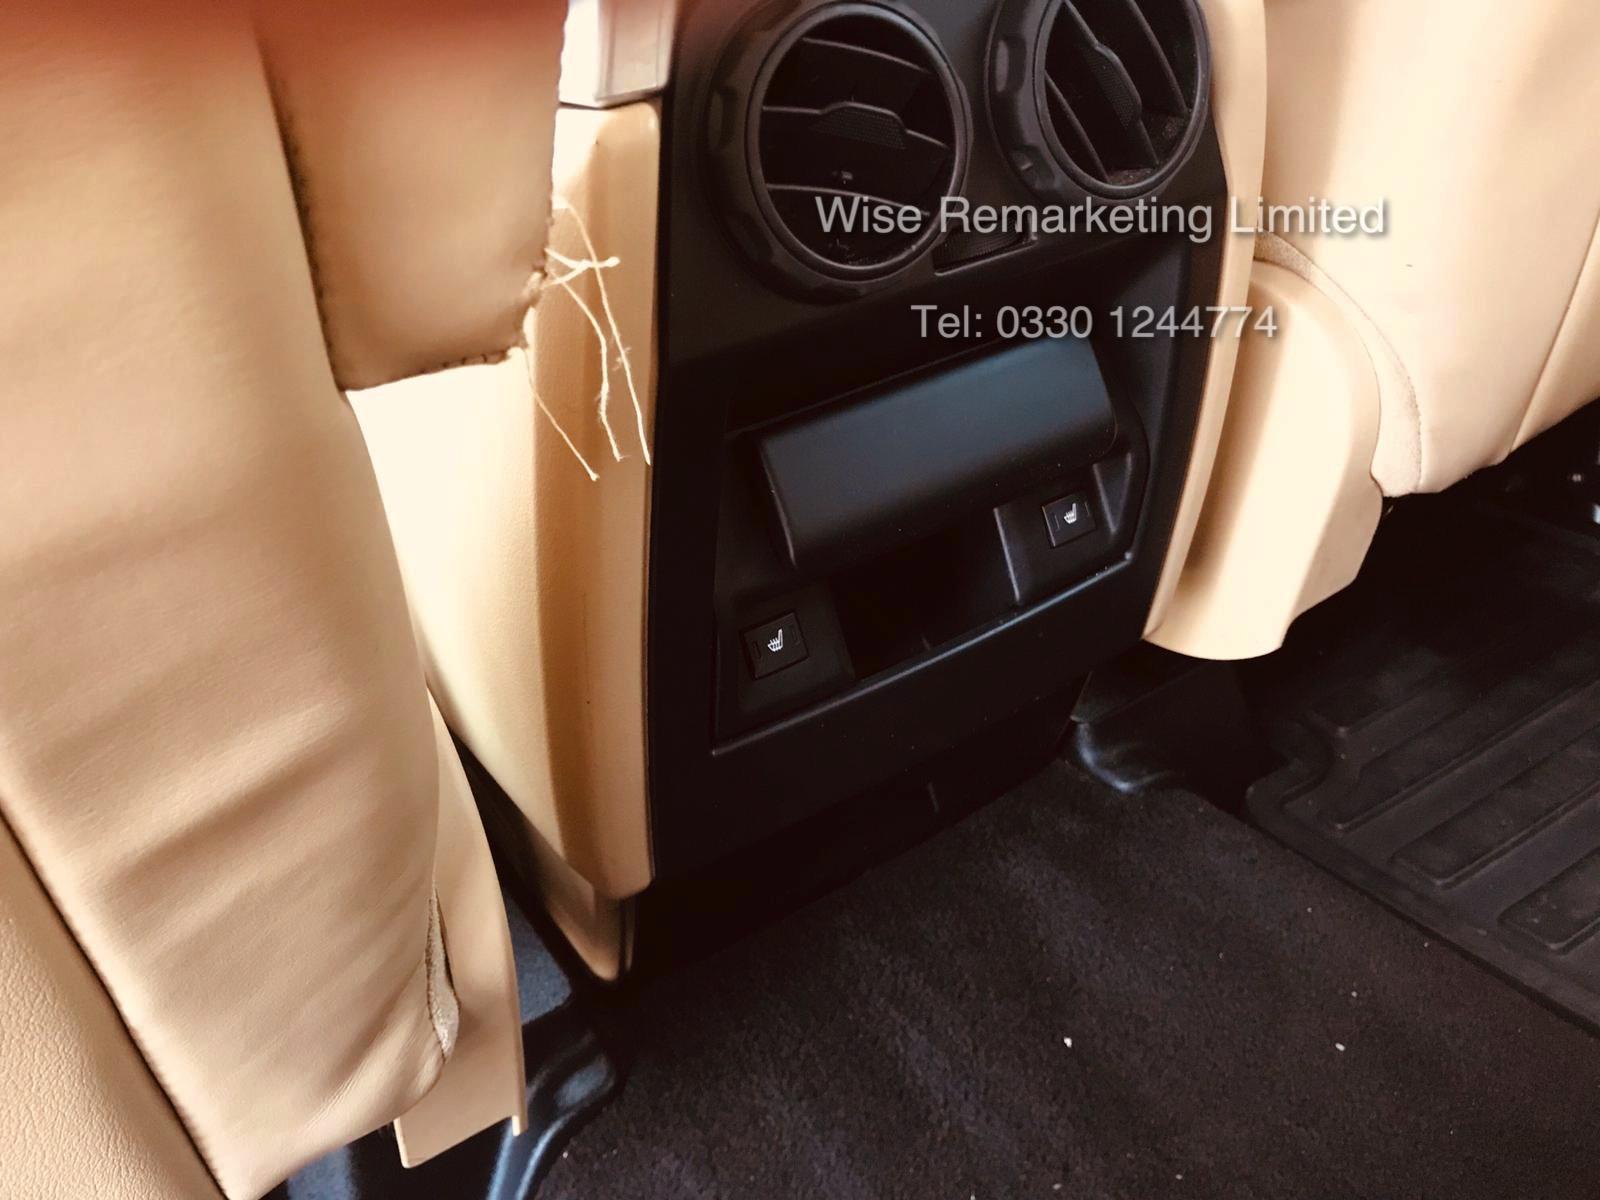 Range Rover Sport 2.7 TDV6 HSE Auto - 2008 Model - Cream Leather - Sat Nav - Heated Seats - Image 16 of 19